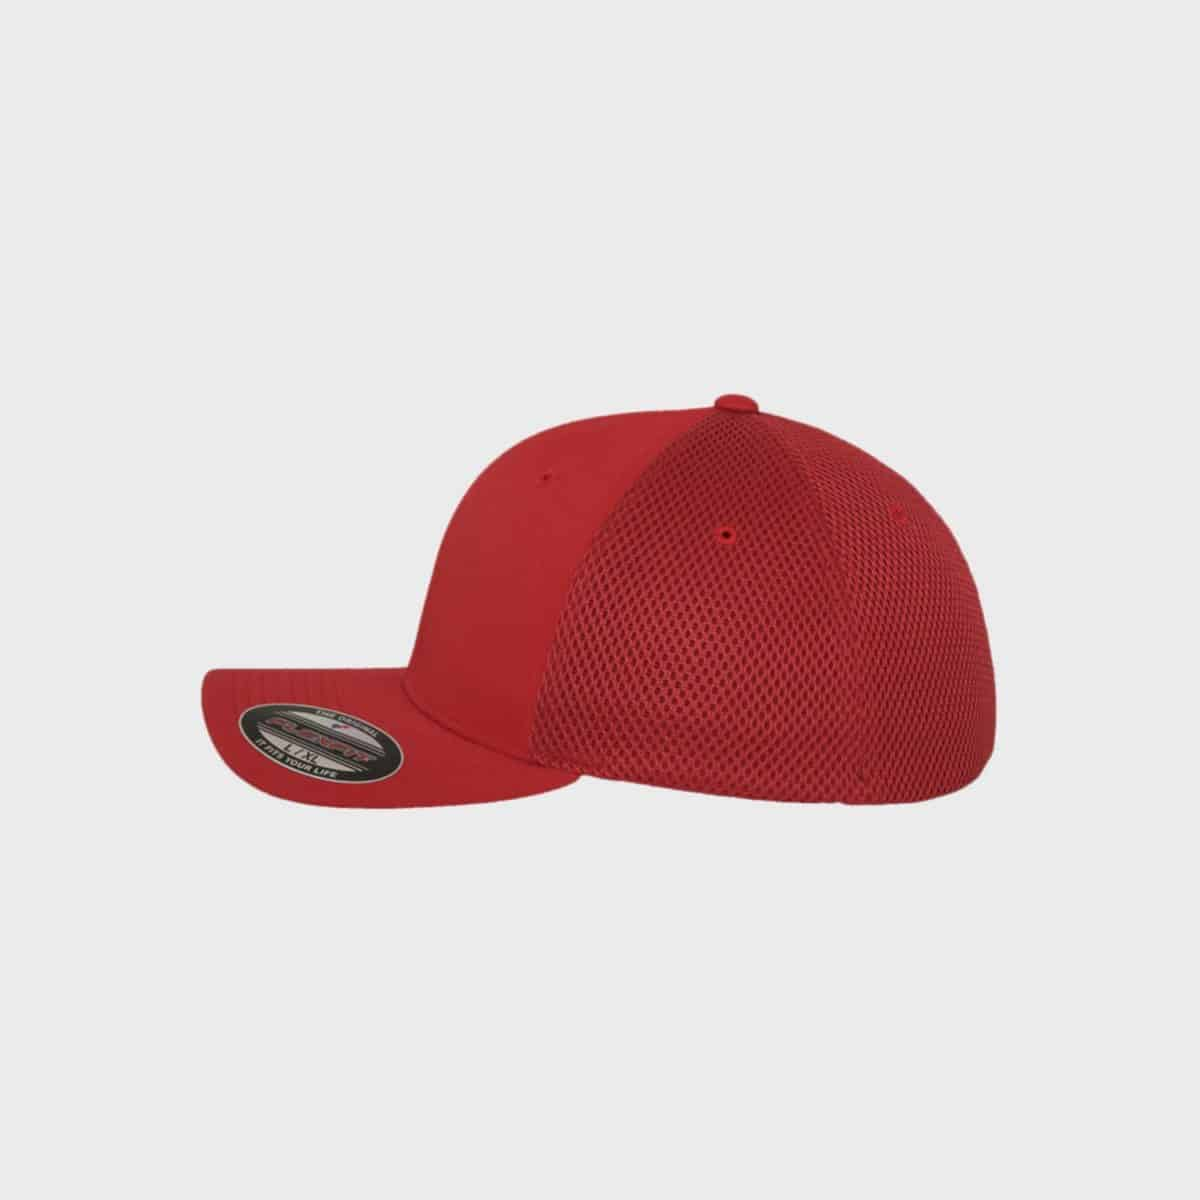 Flexfit FlexfitCaps FFE 6533 Red Side